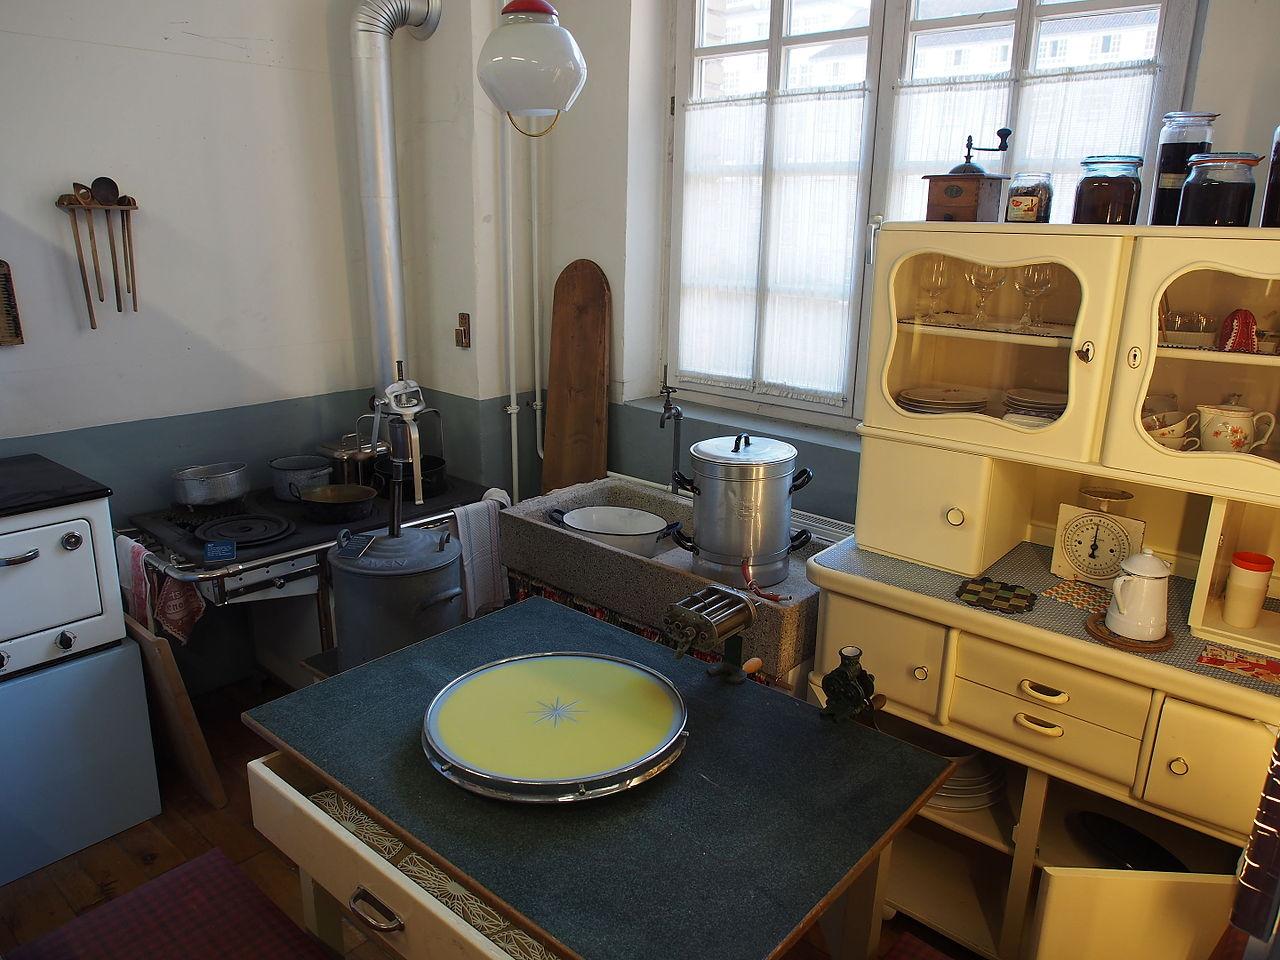 File:Alte Küche, 50s kitchen.JPG - Wikimedia Commons